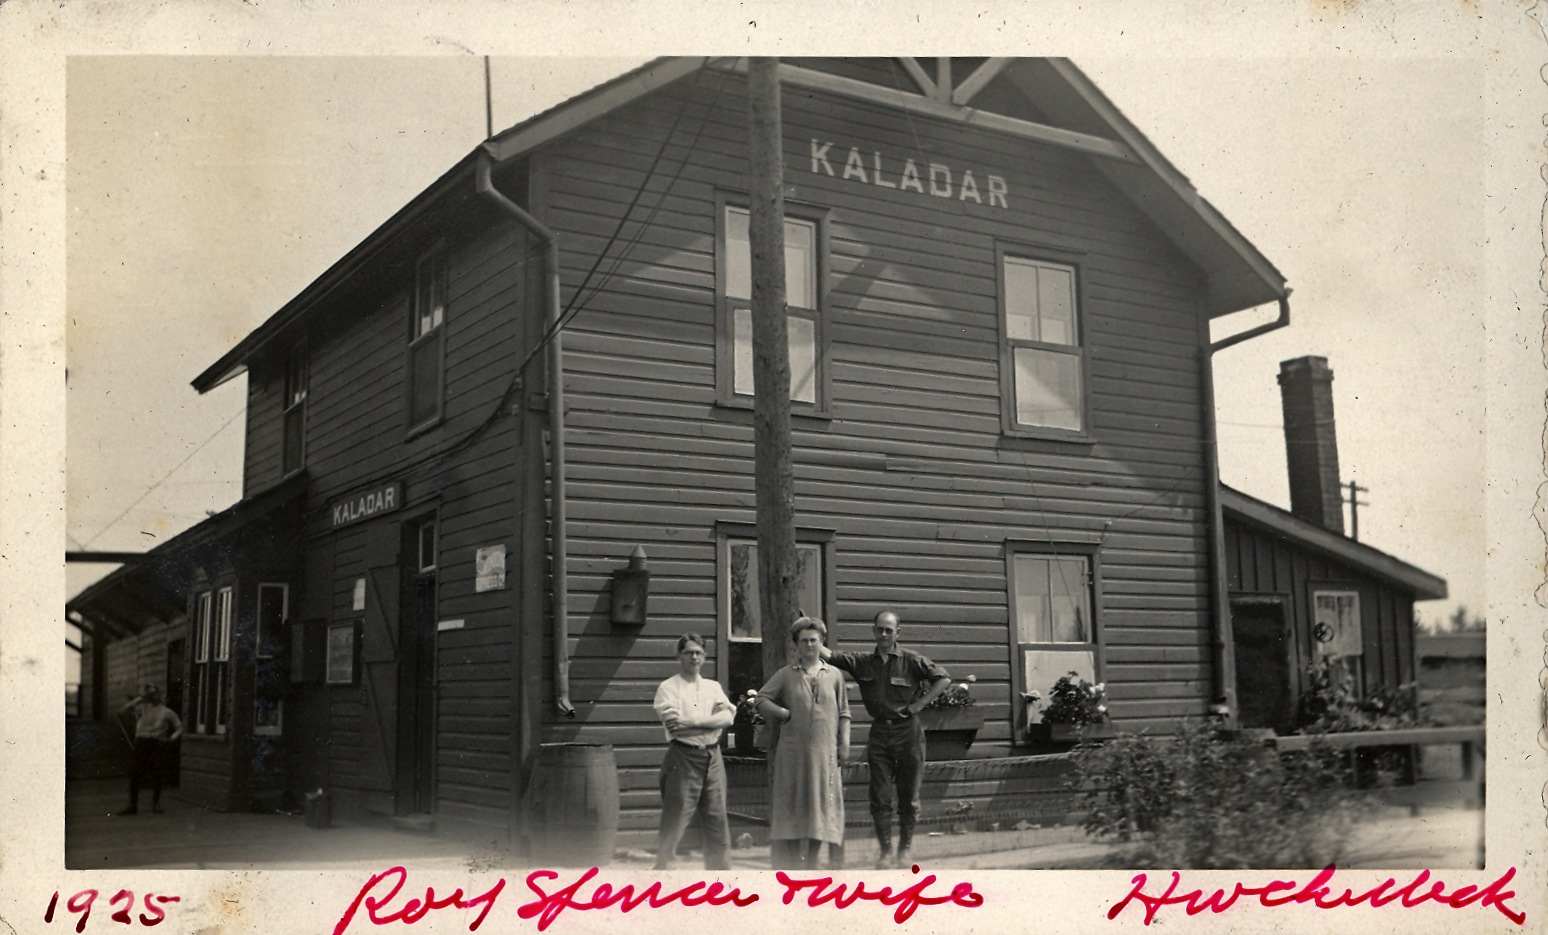 Kaladar Railway Station 1925